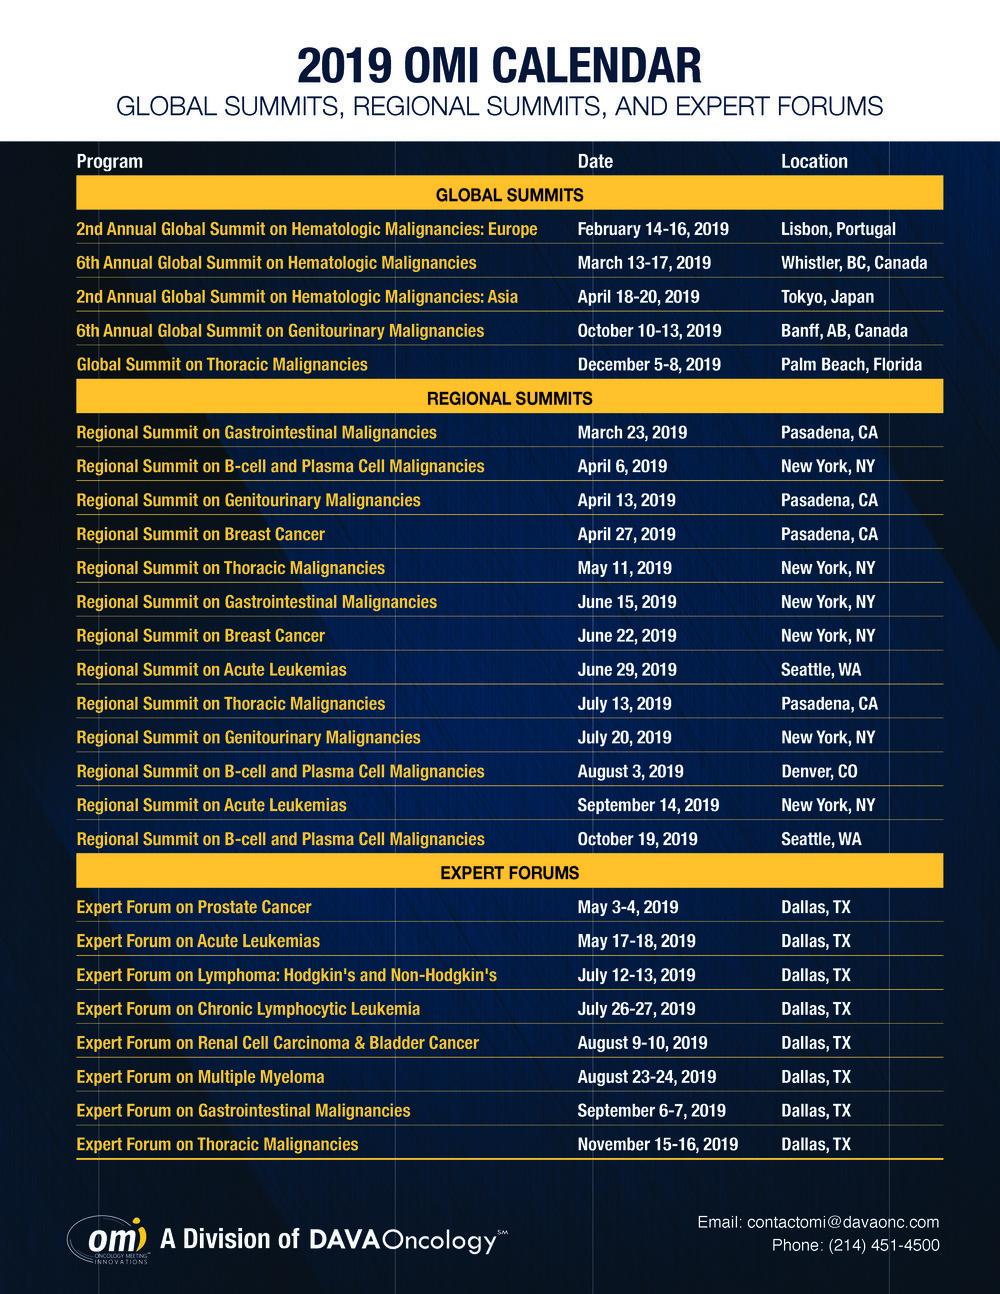 2019 OMI Calendar.jpg